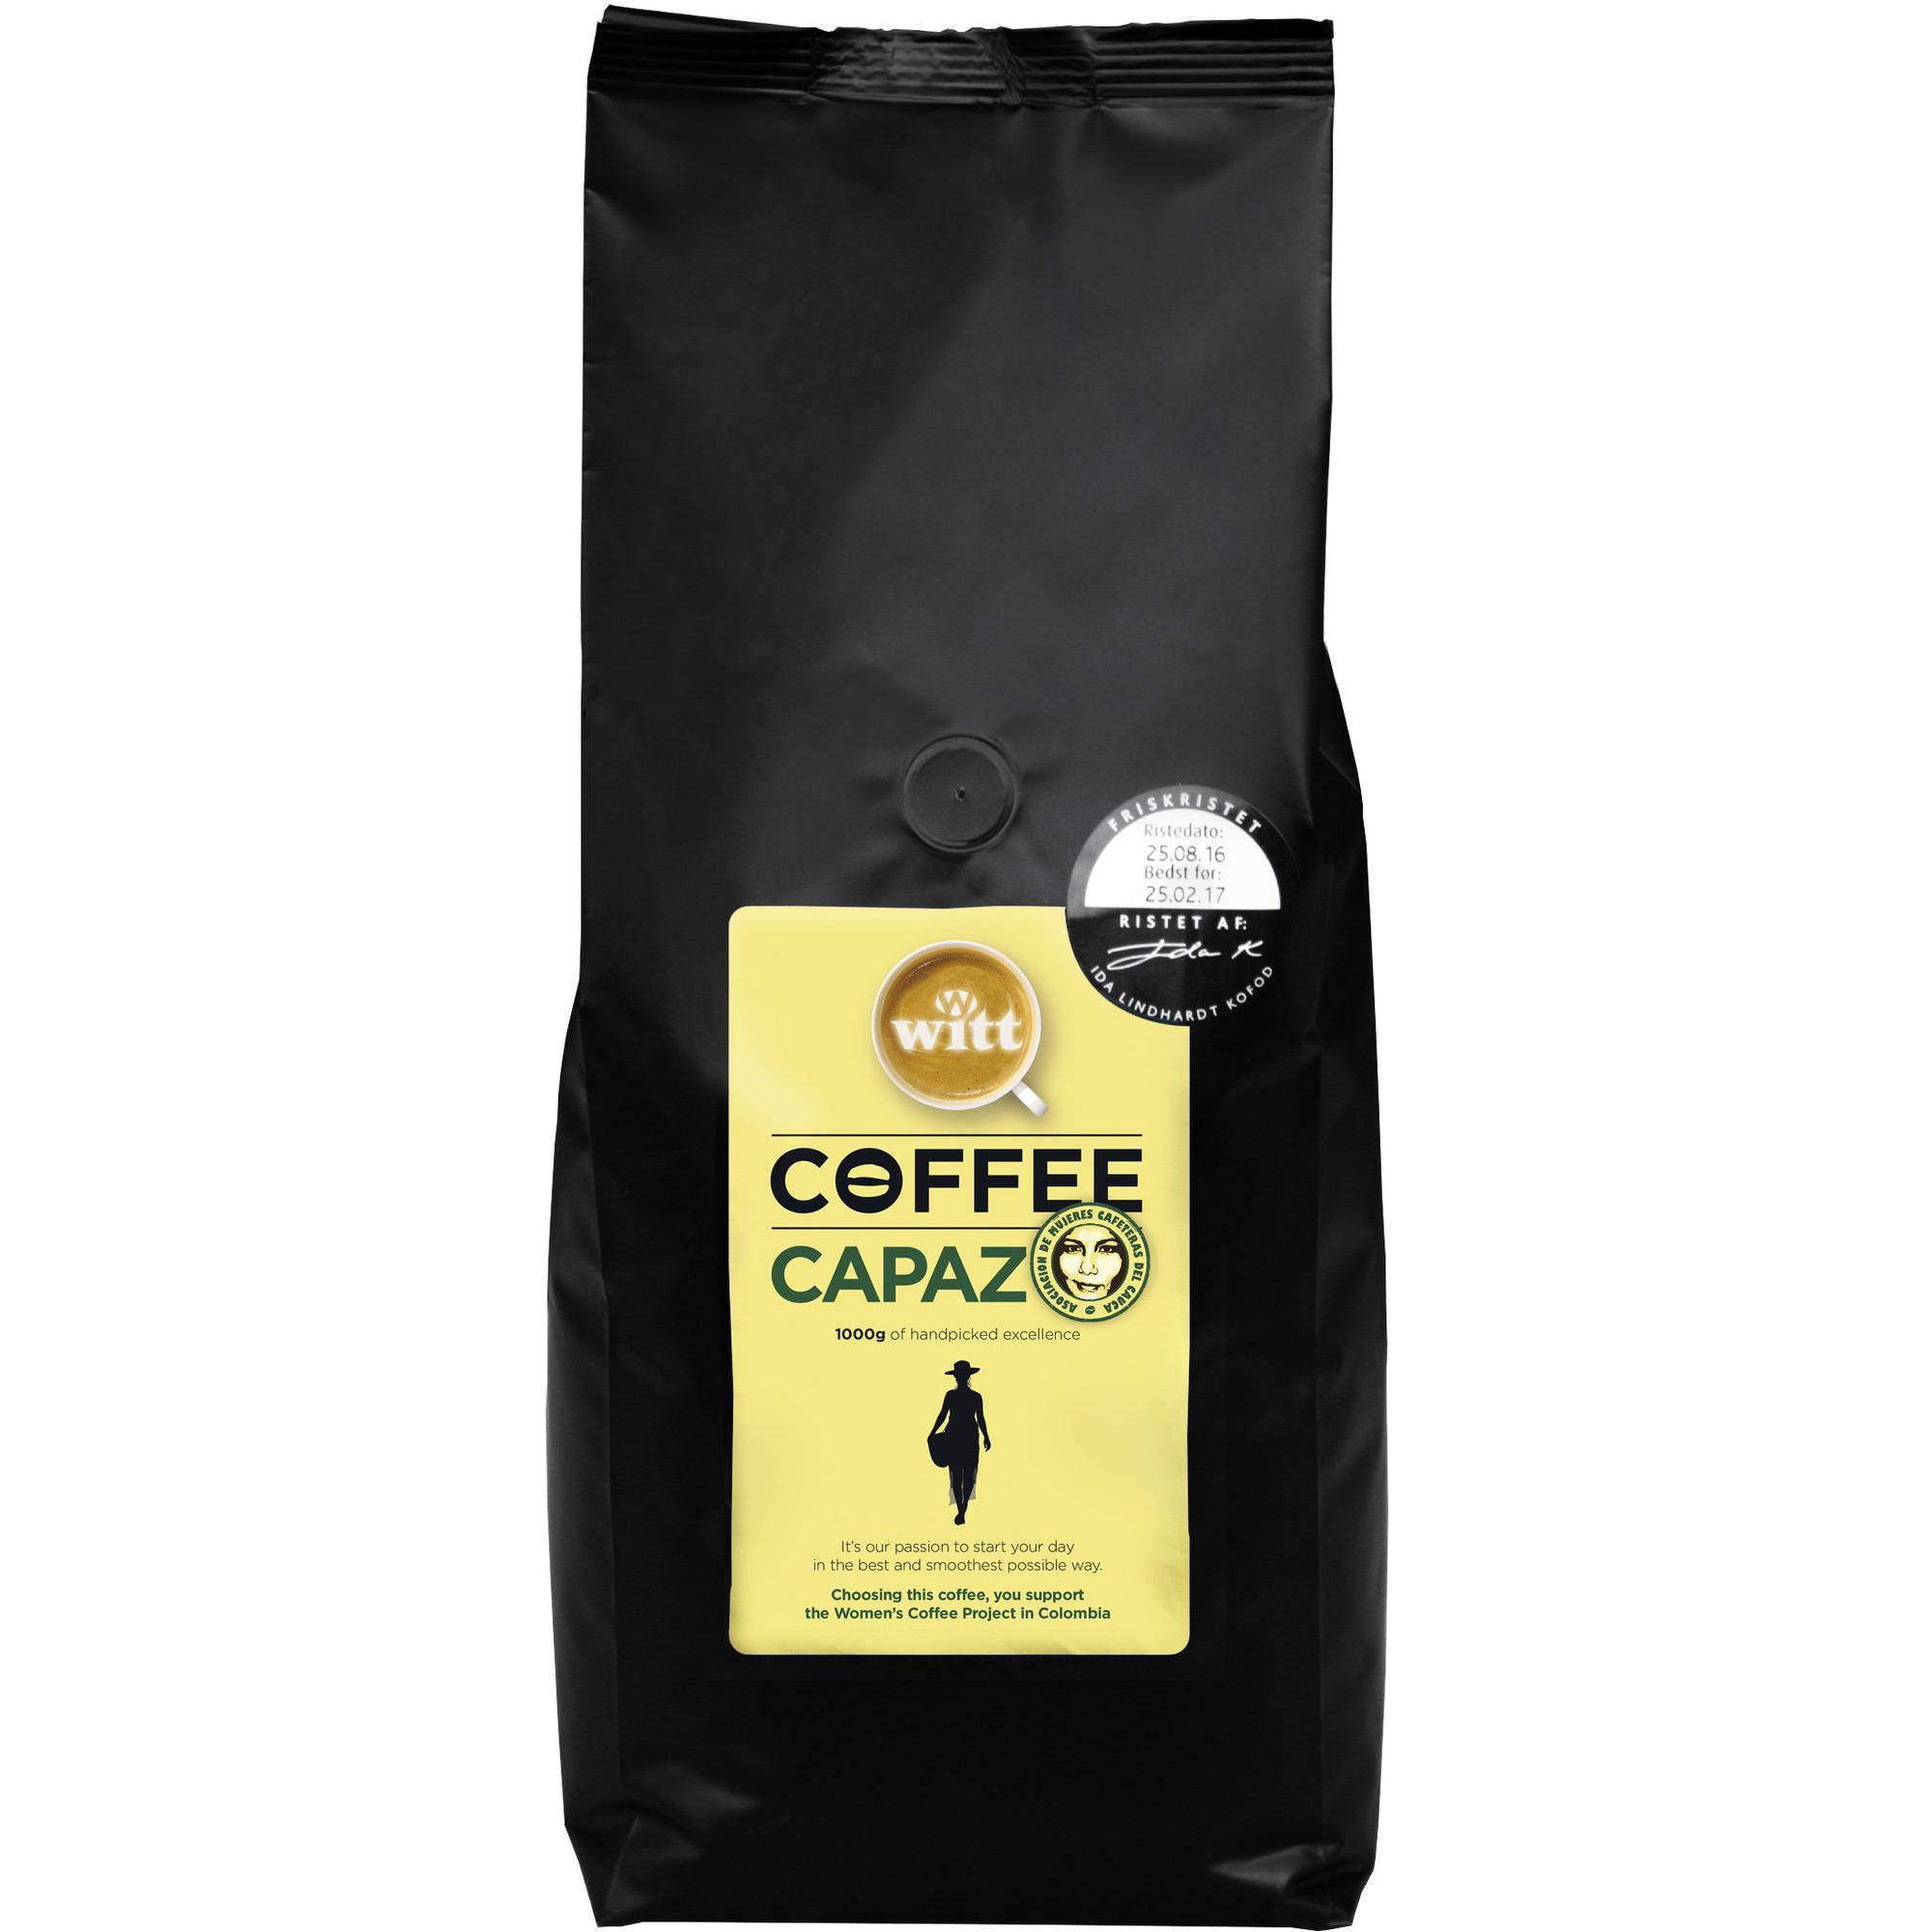 Witt Capaz kaffebönor